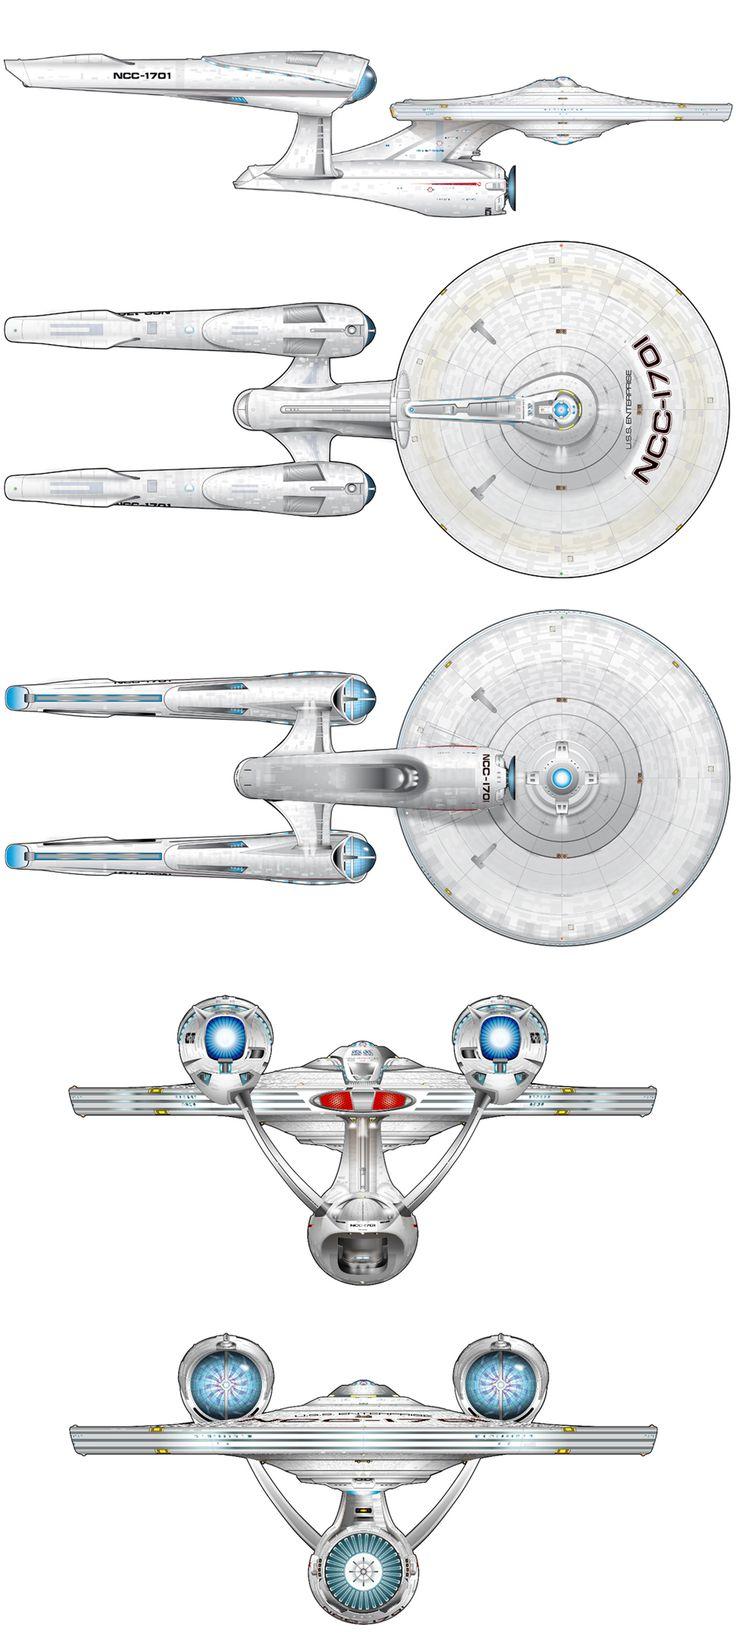 Uss Enterprise Diagram 66 Phone Block Wiring Of Star Trek Ship Great Installation New Blueprints Halloween Schematics